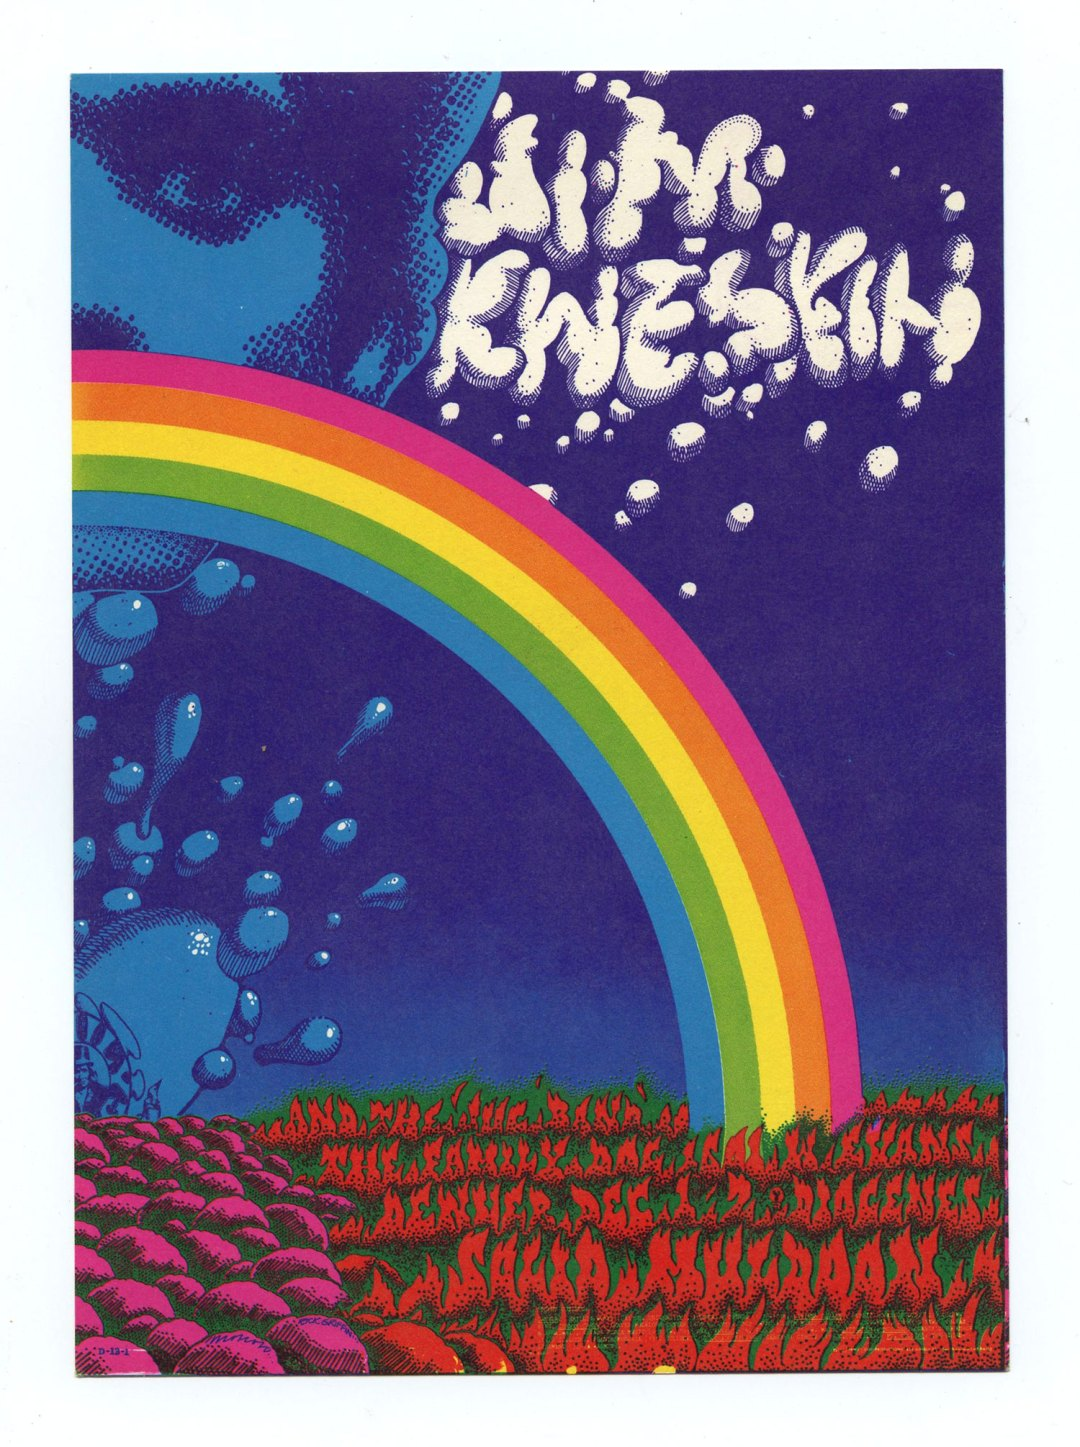 FDD 13 Postcard Denver Jim Kweskin Jug Band 1967 Dec 1